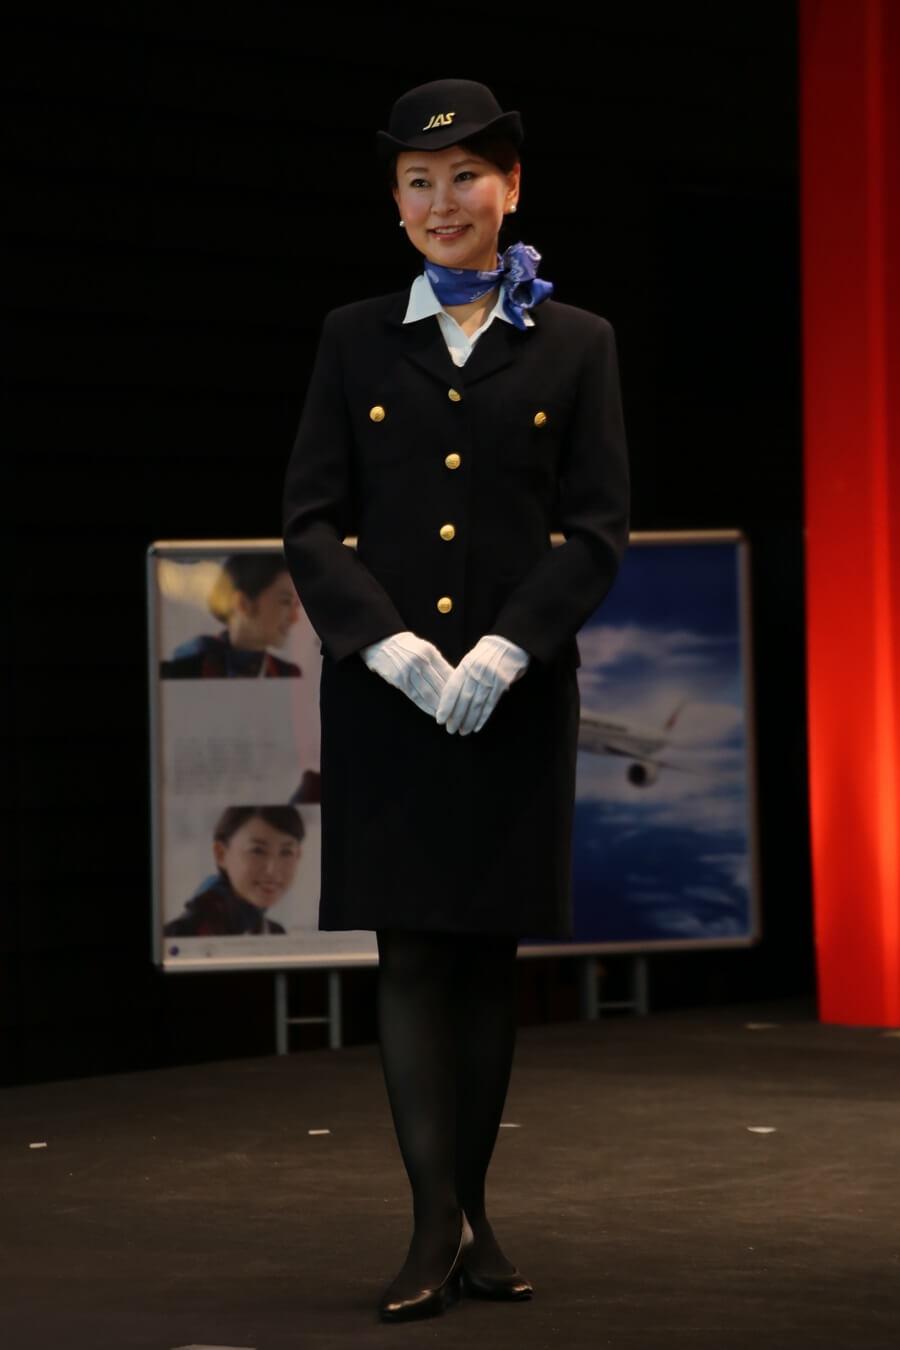 JAS5代目制服 JALとJEX客室乗務員歴代制服ファッションショー 客室乗務員 スチワーデス 歴代ユニフォーム 制服 空の日フェスティバル JAL fashion show (13)